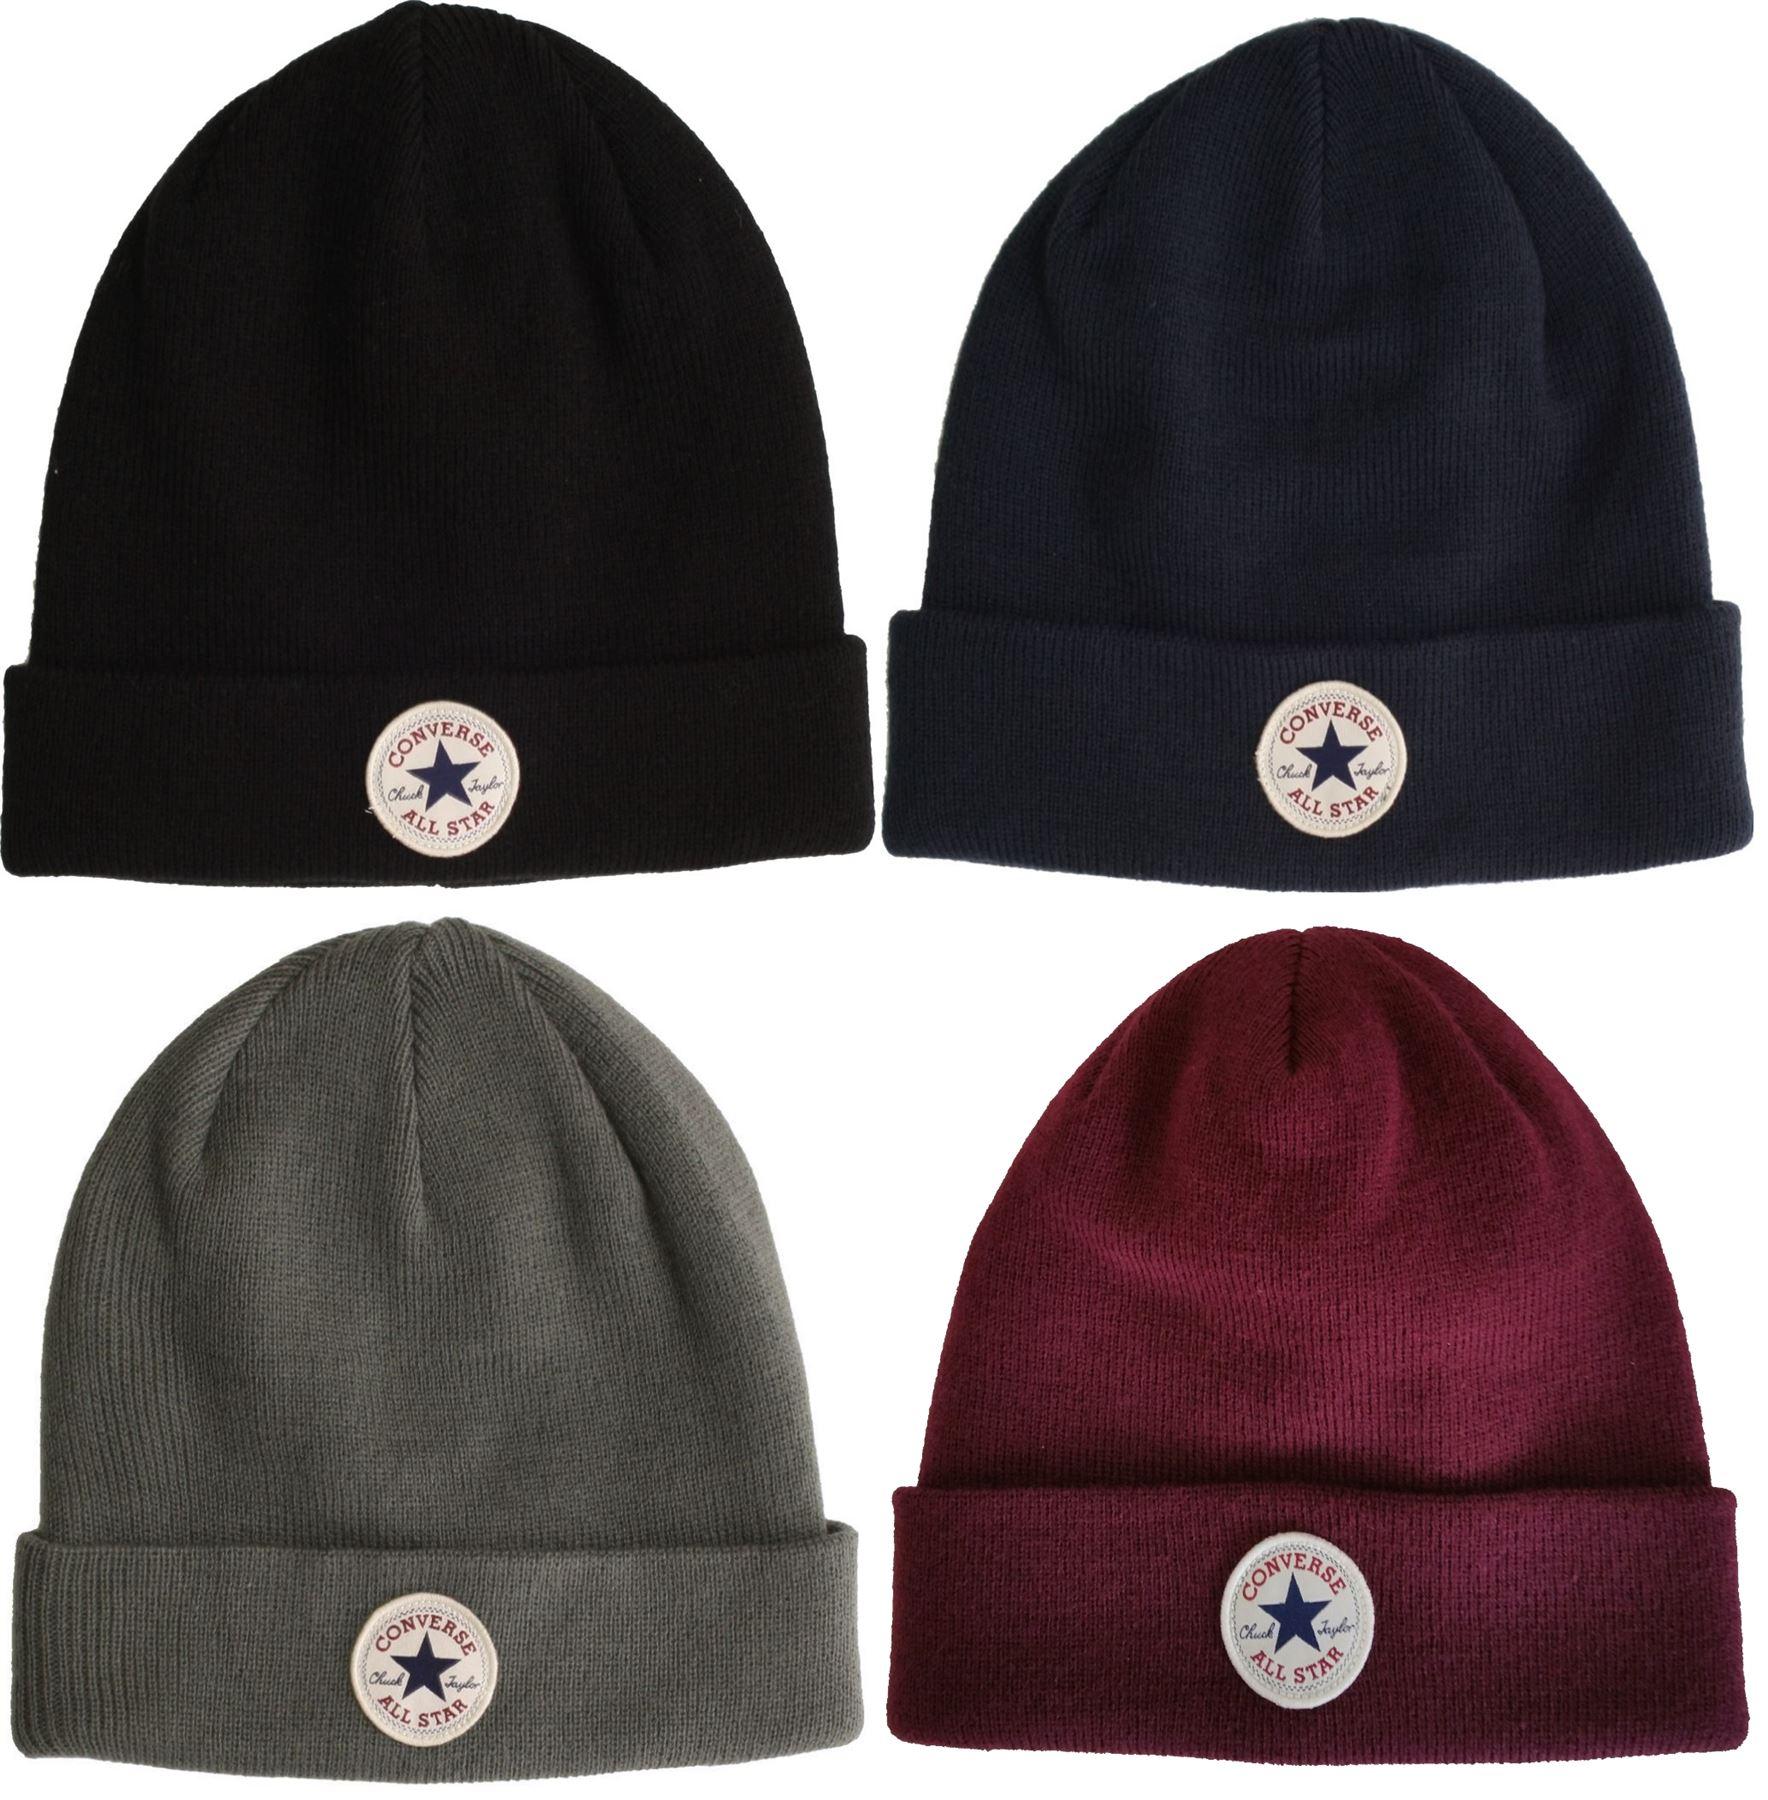 6a8fbf9e990 Converse Beanie Bobble Hats All Star Classic Knitted - Black